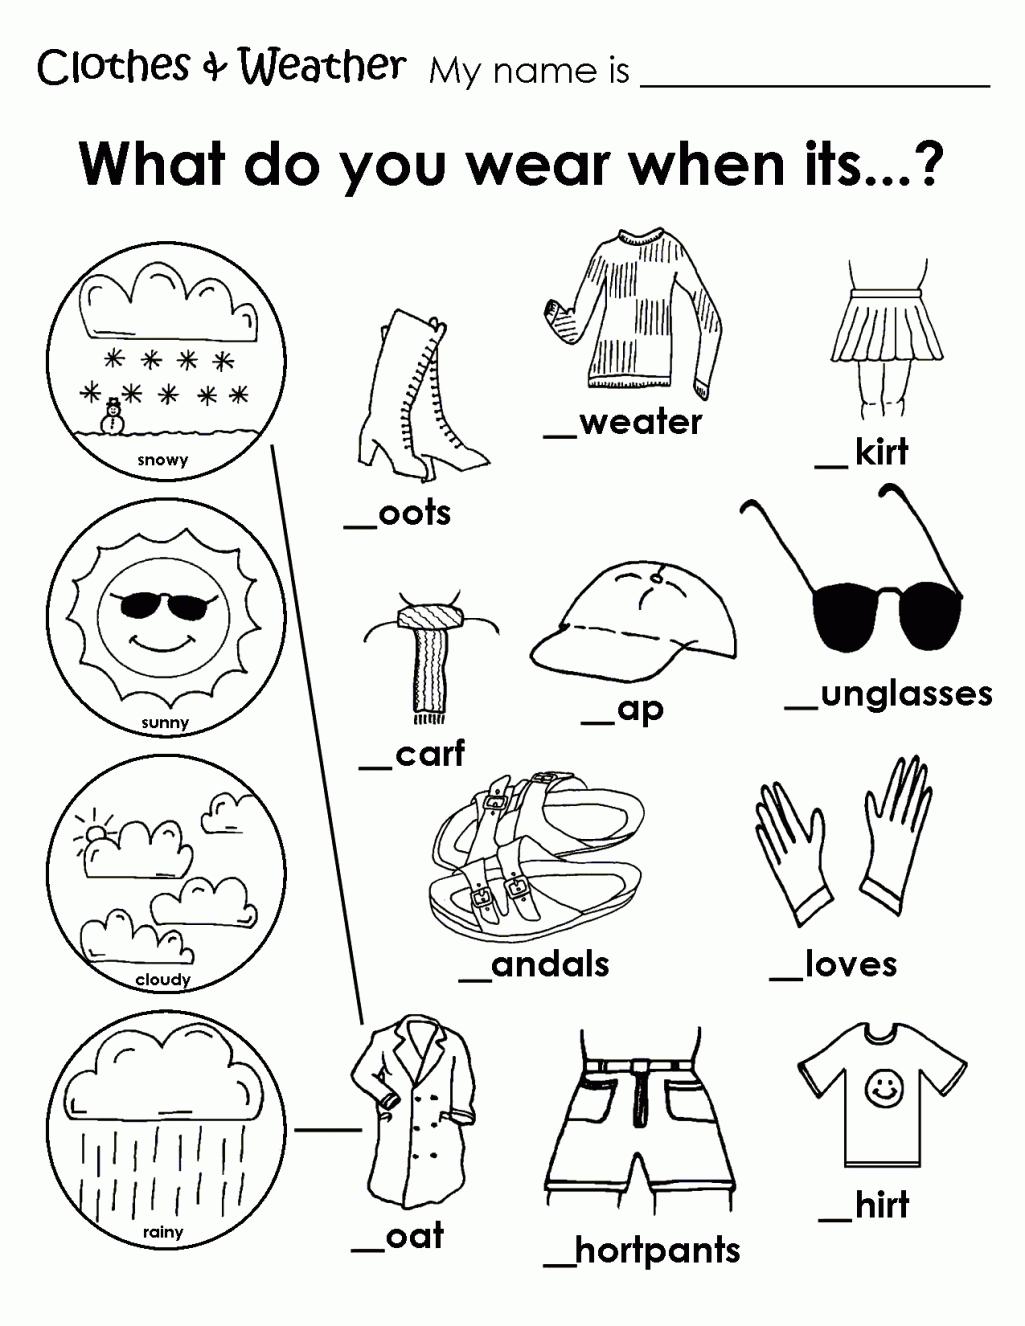 Printable Weather Clothes Worksheet – Worksheets Samples